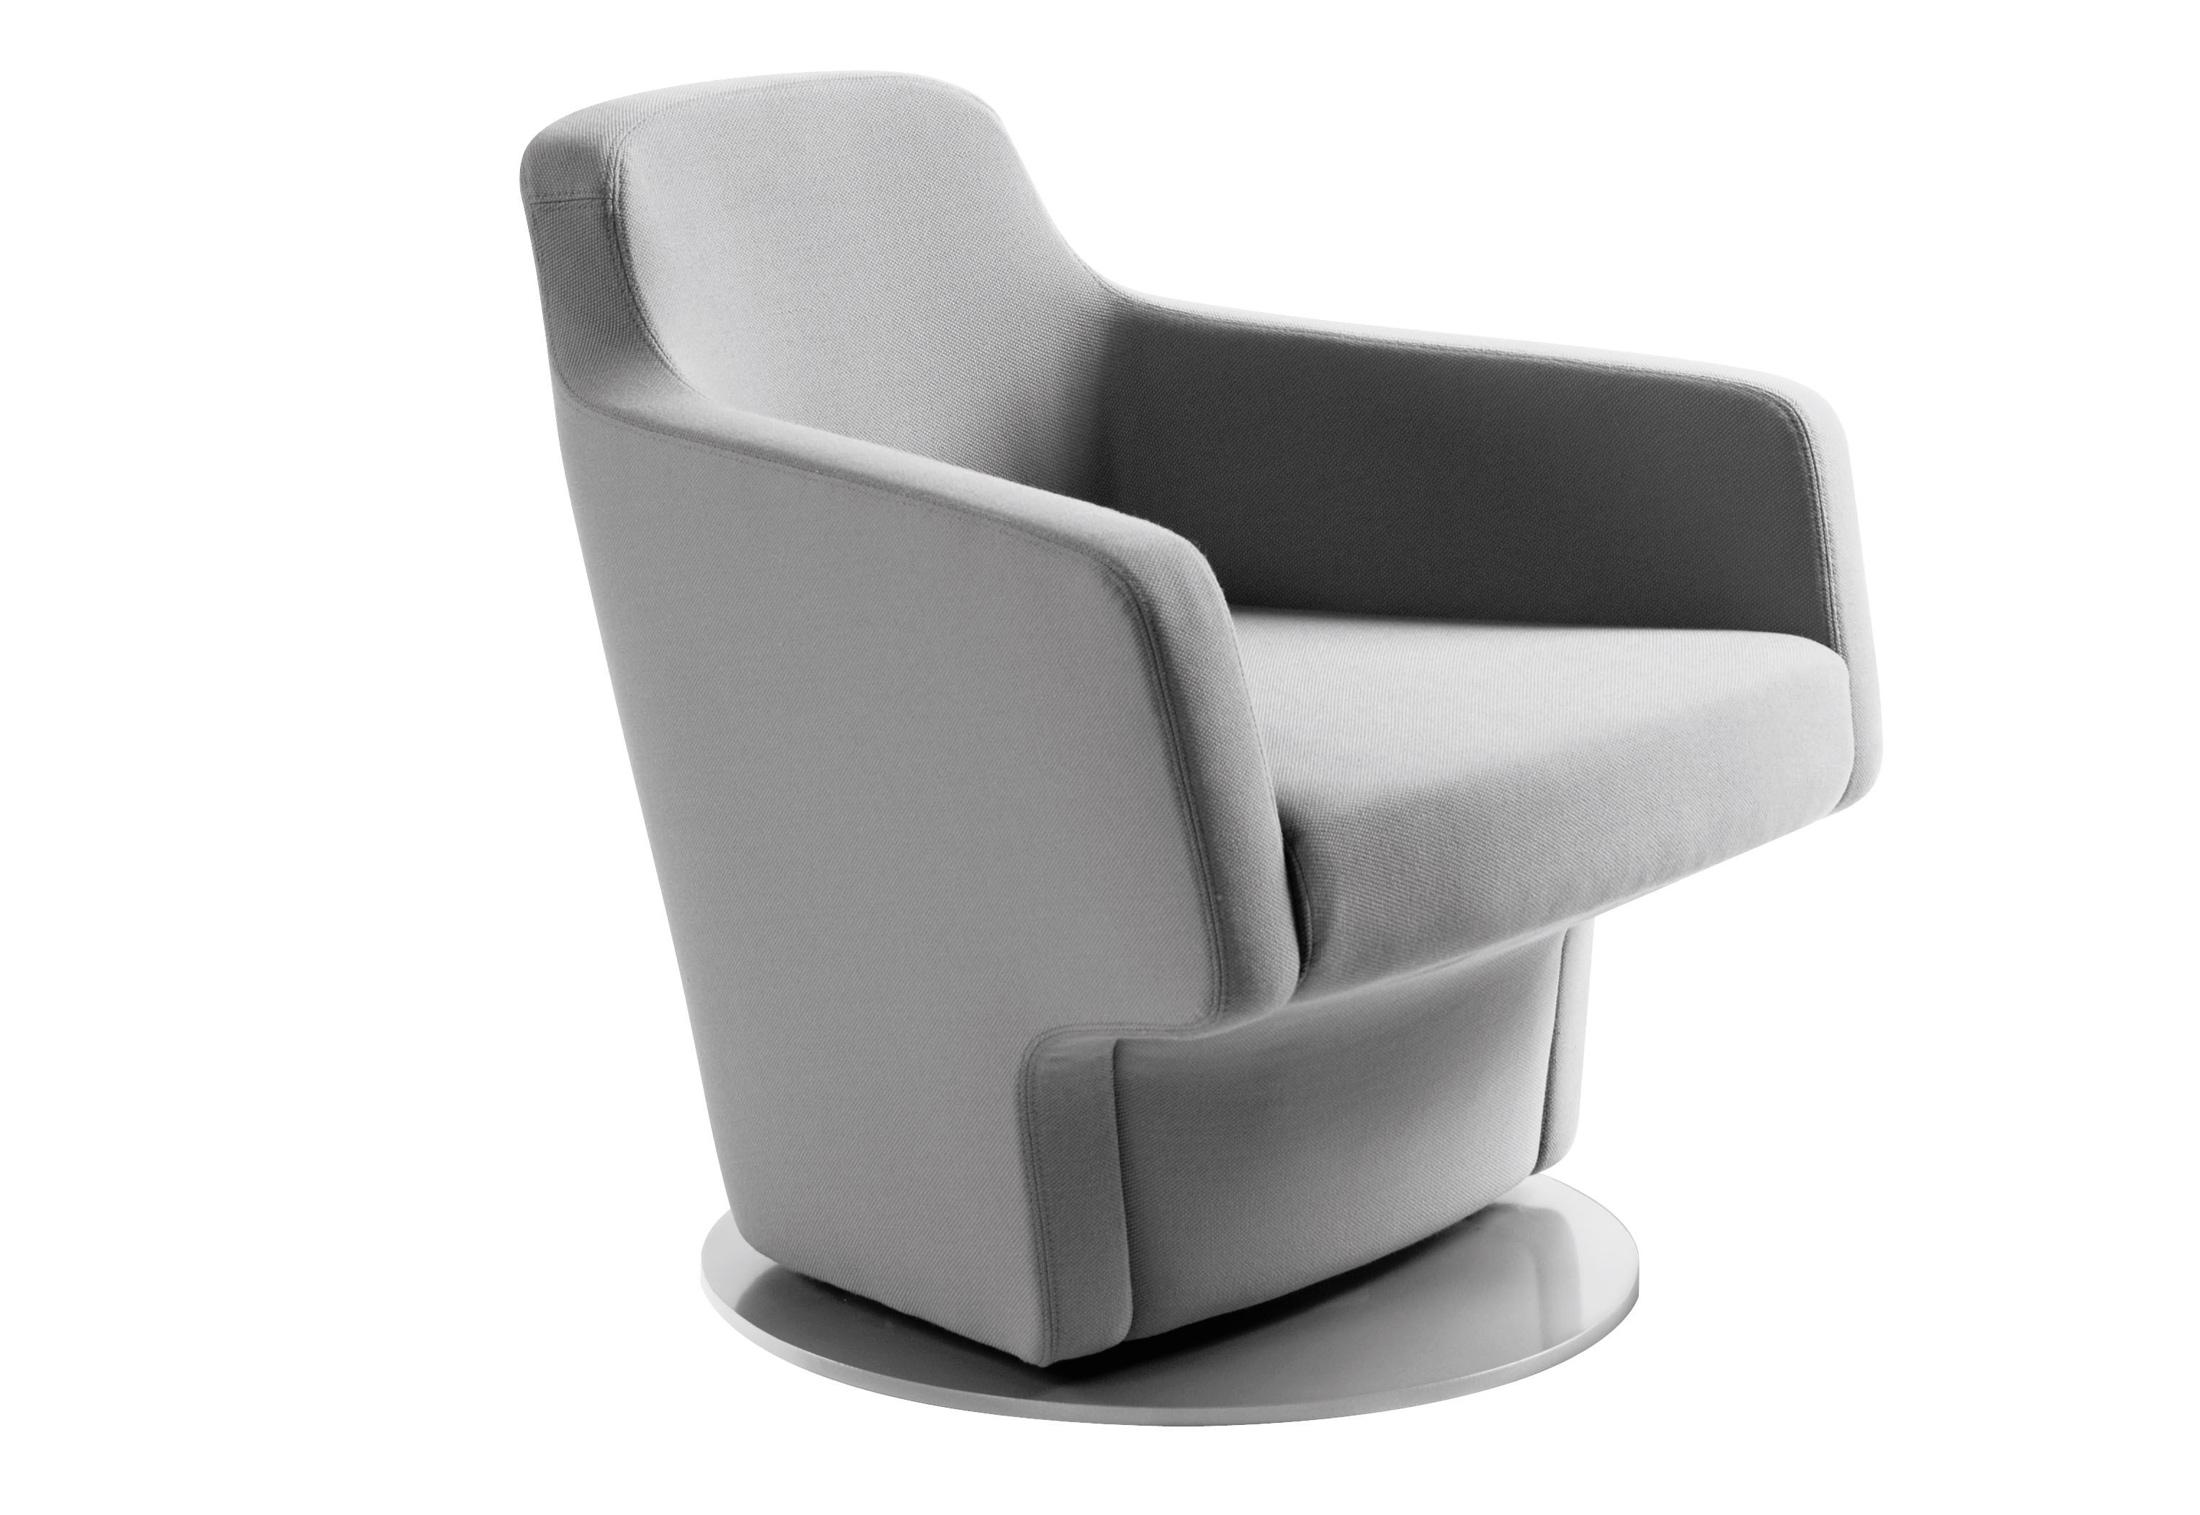 revolving chair manufacturer in nagpur hanging online kalio easy by dietiker stylepark